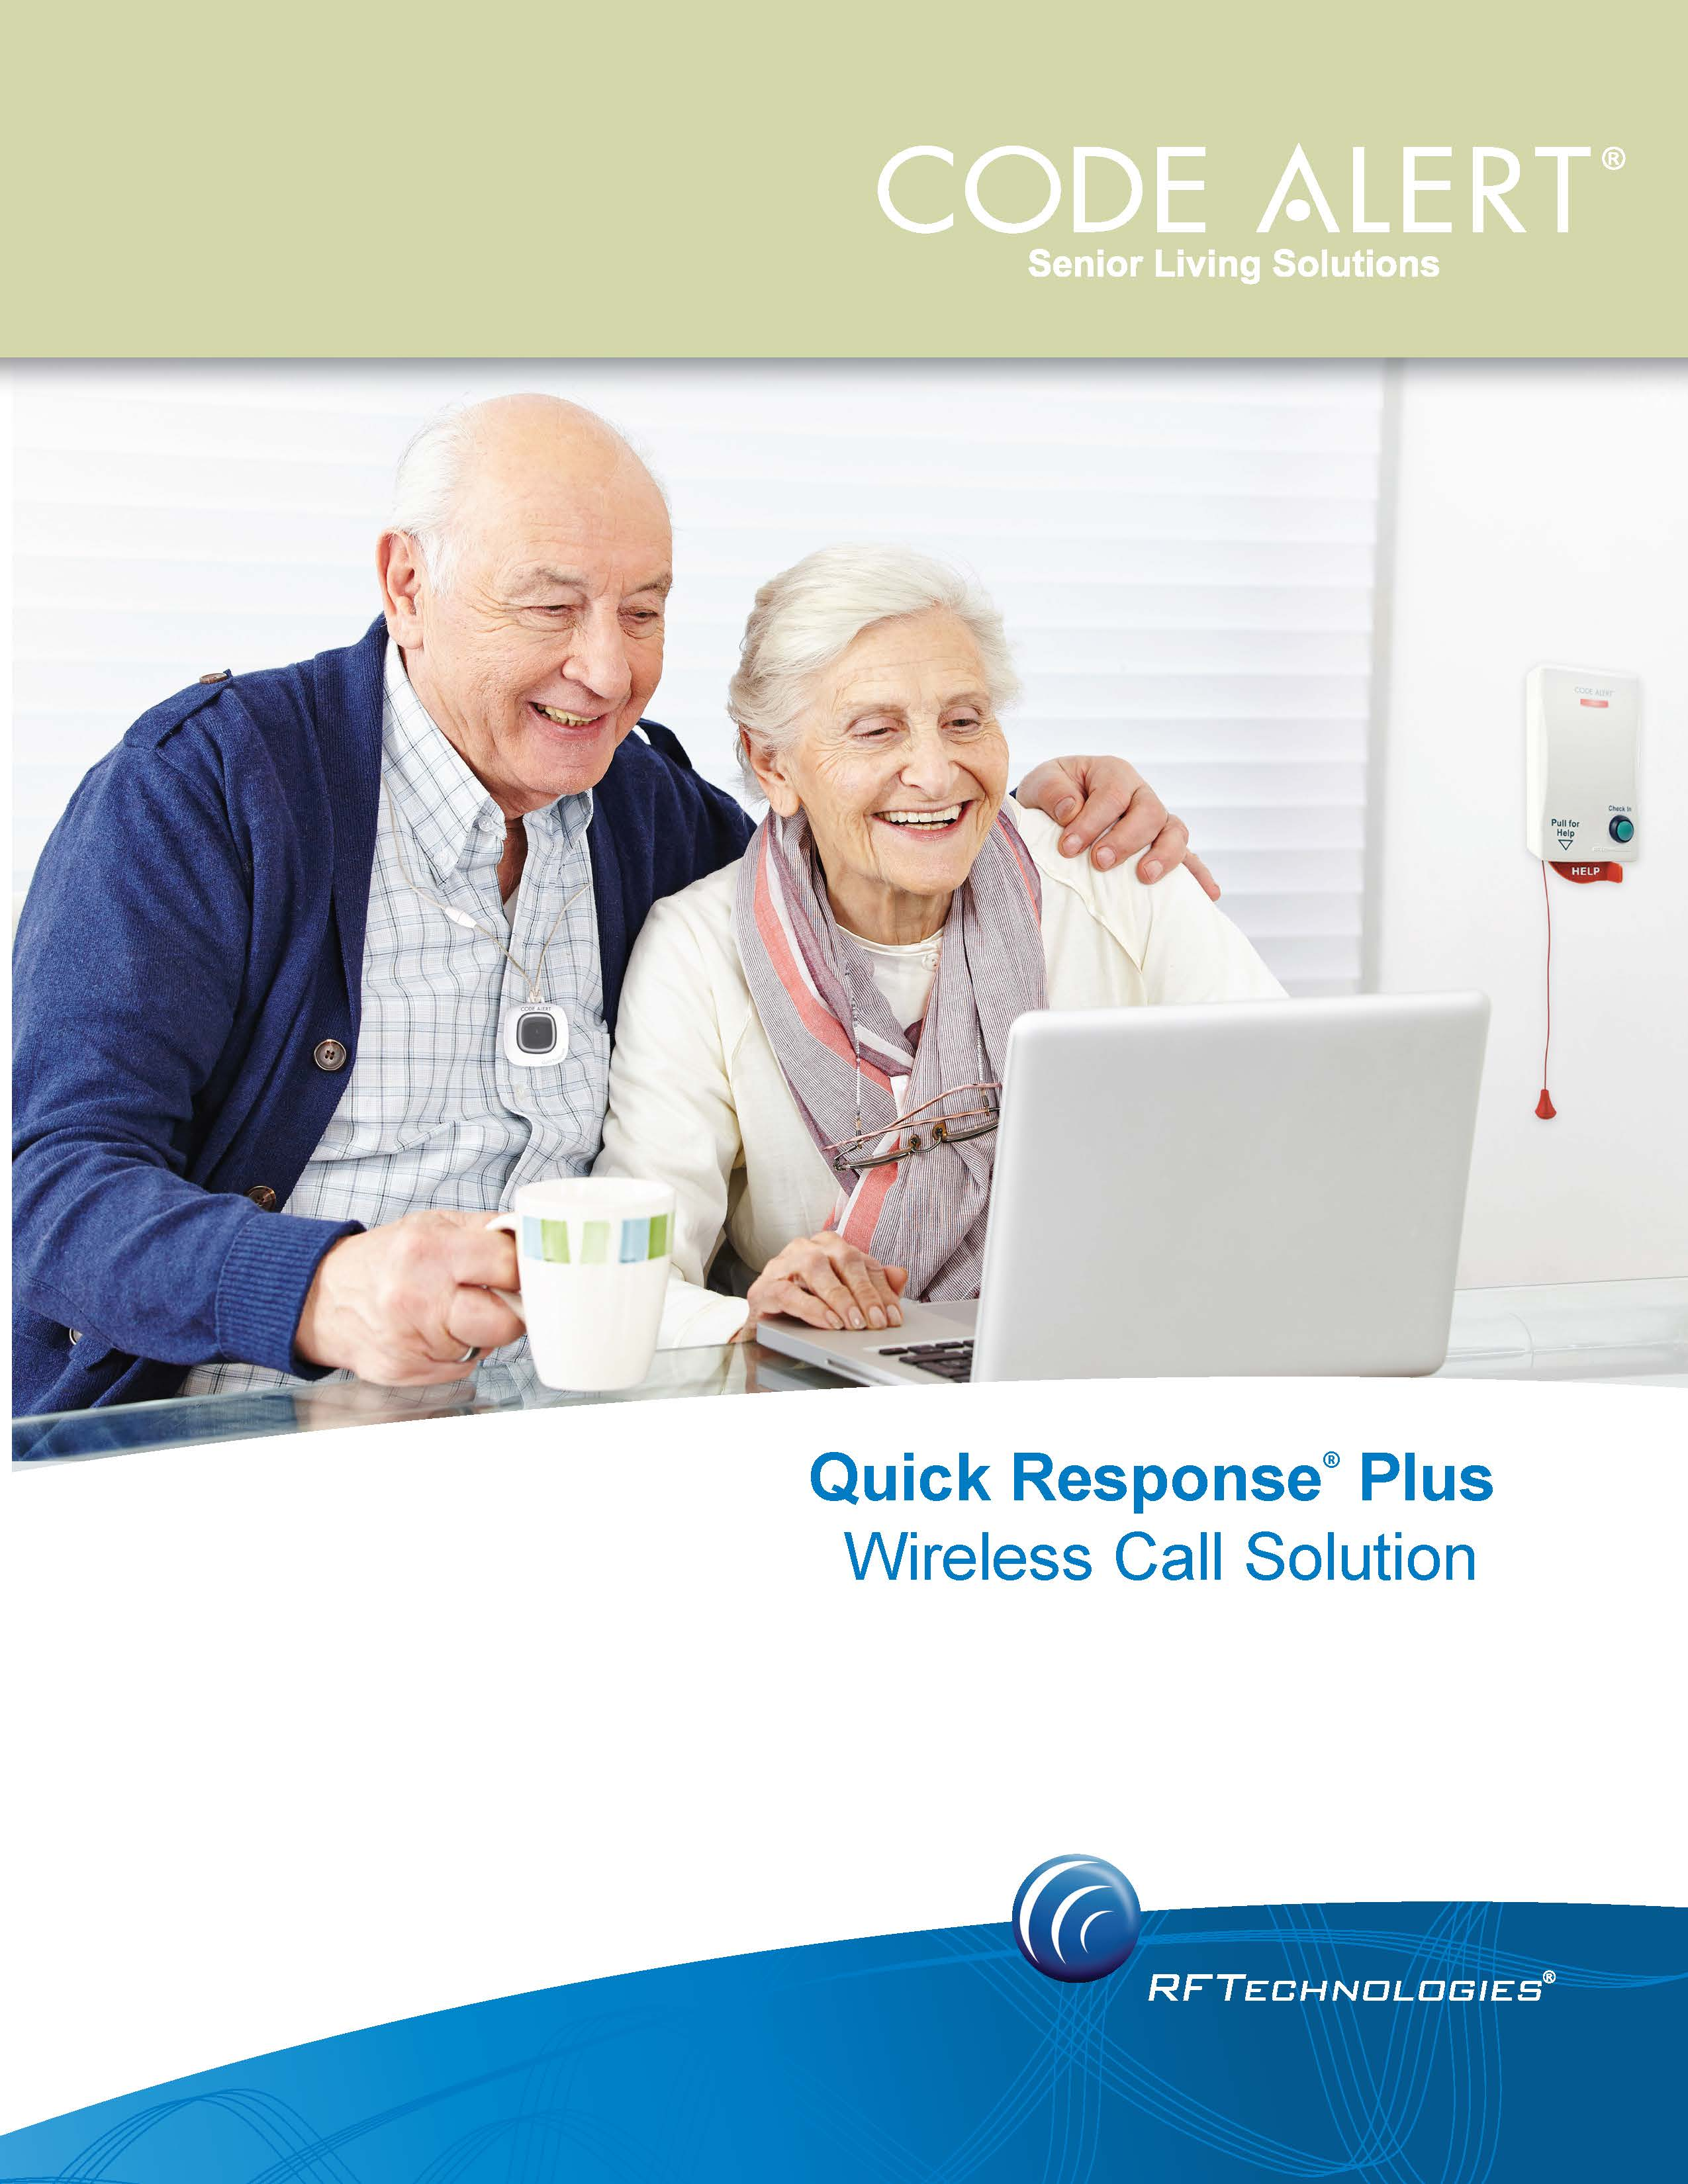 Quick Response Plus Wireless Call Solution